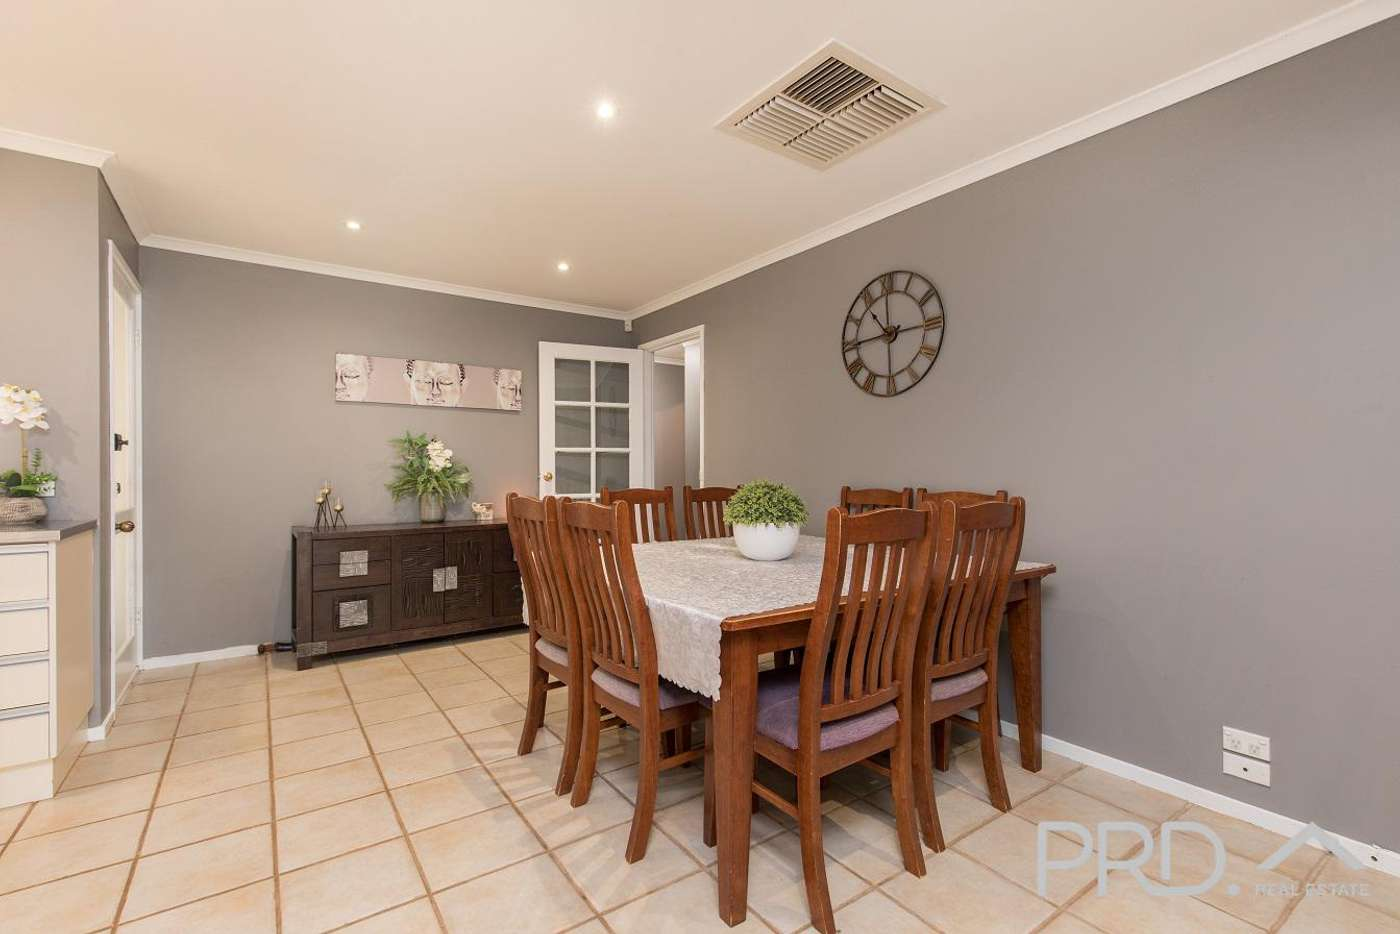 Seventh view of Homely house listing, 13 Kiata Drive, Mildura VIC 3500